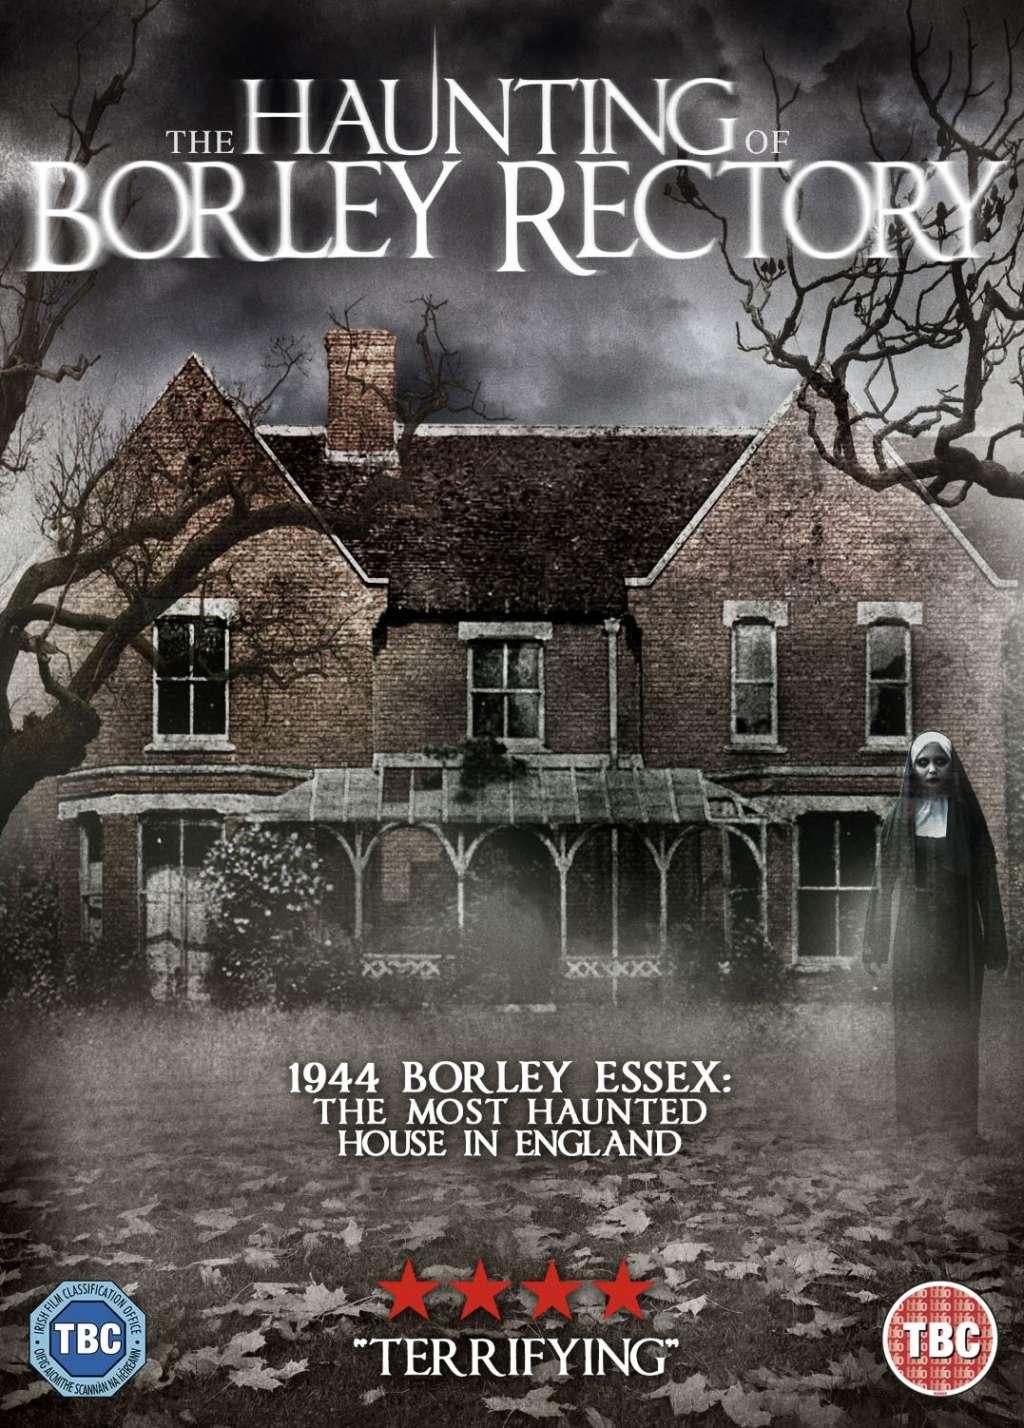 The Haunting of Borley Rectory kapak